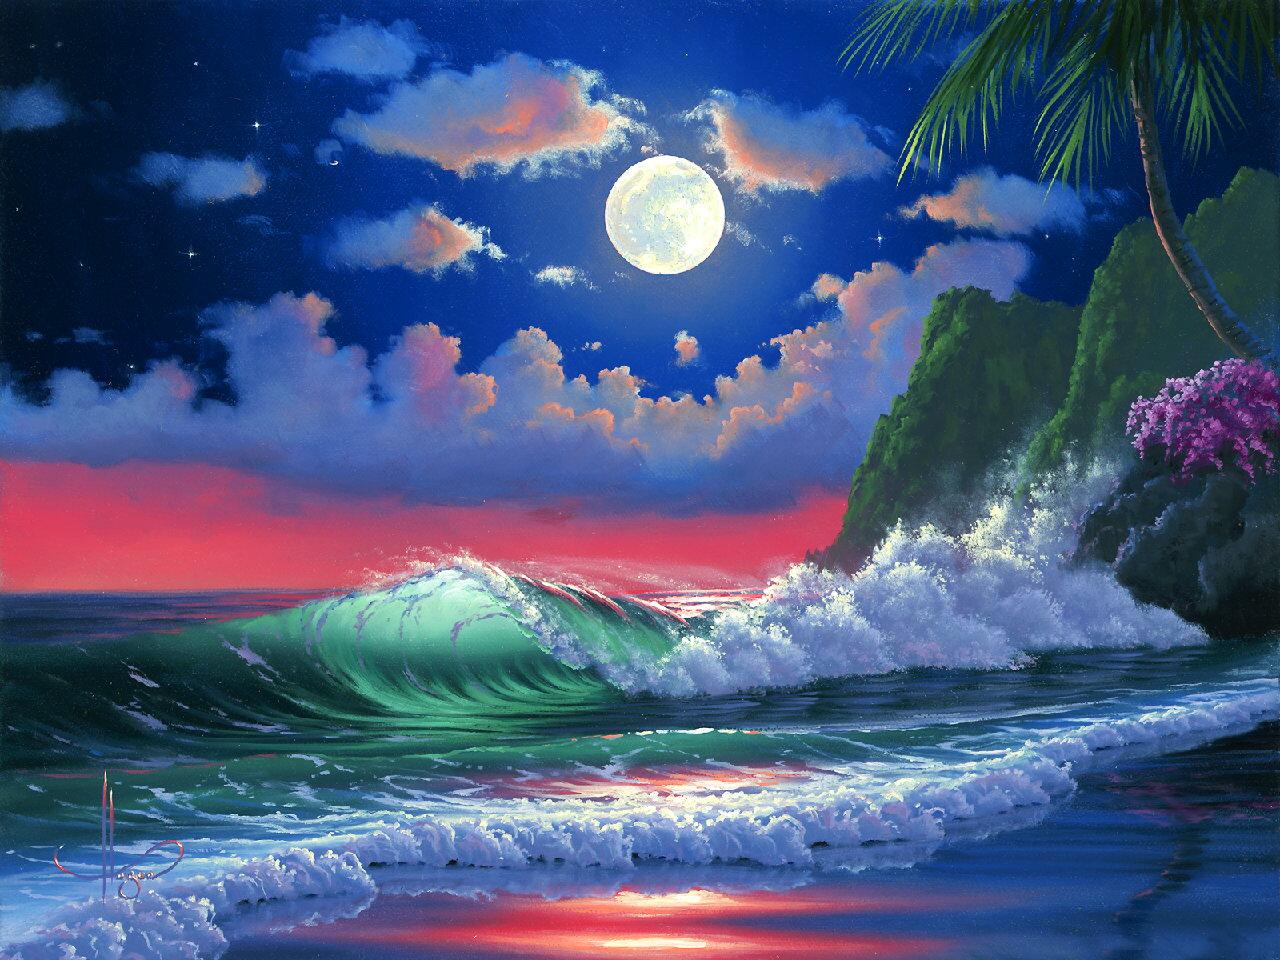 Il mondo di mary antony john al hougue paesaggi hawaiani for Paesaggi marini dipinti